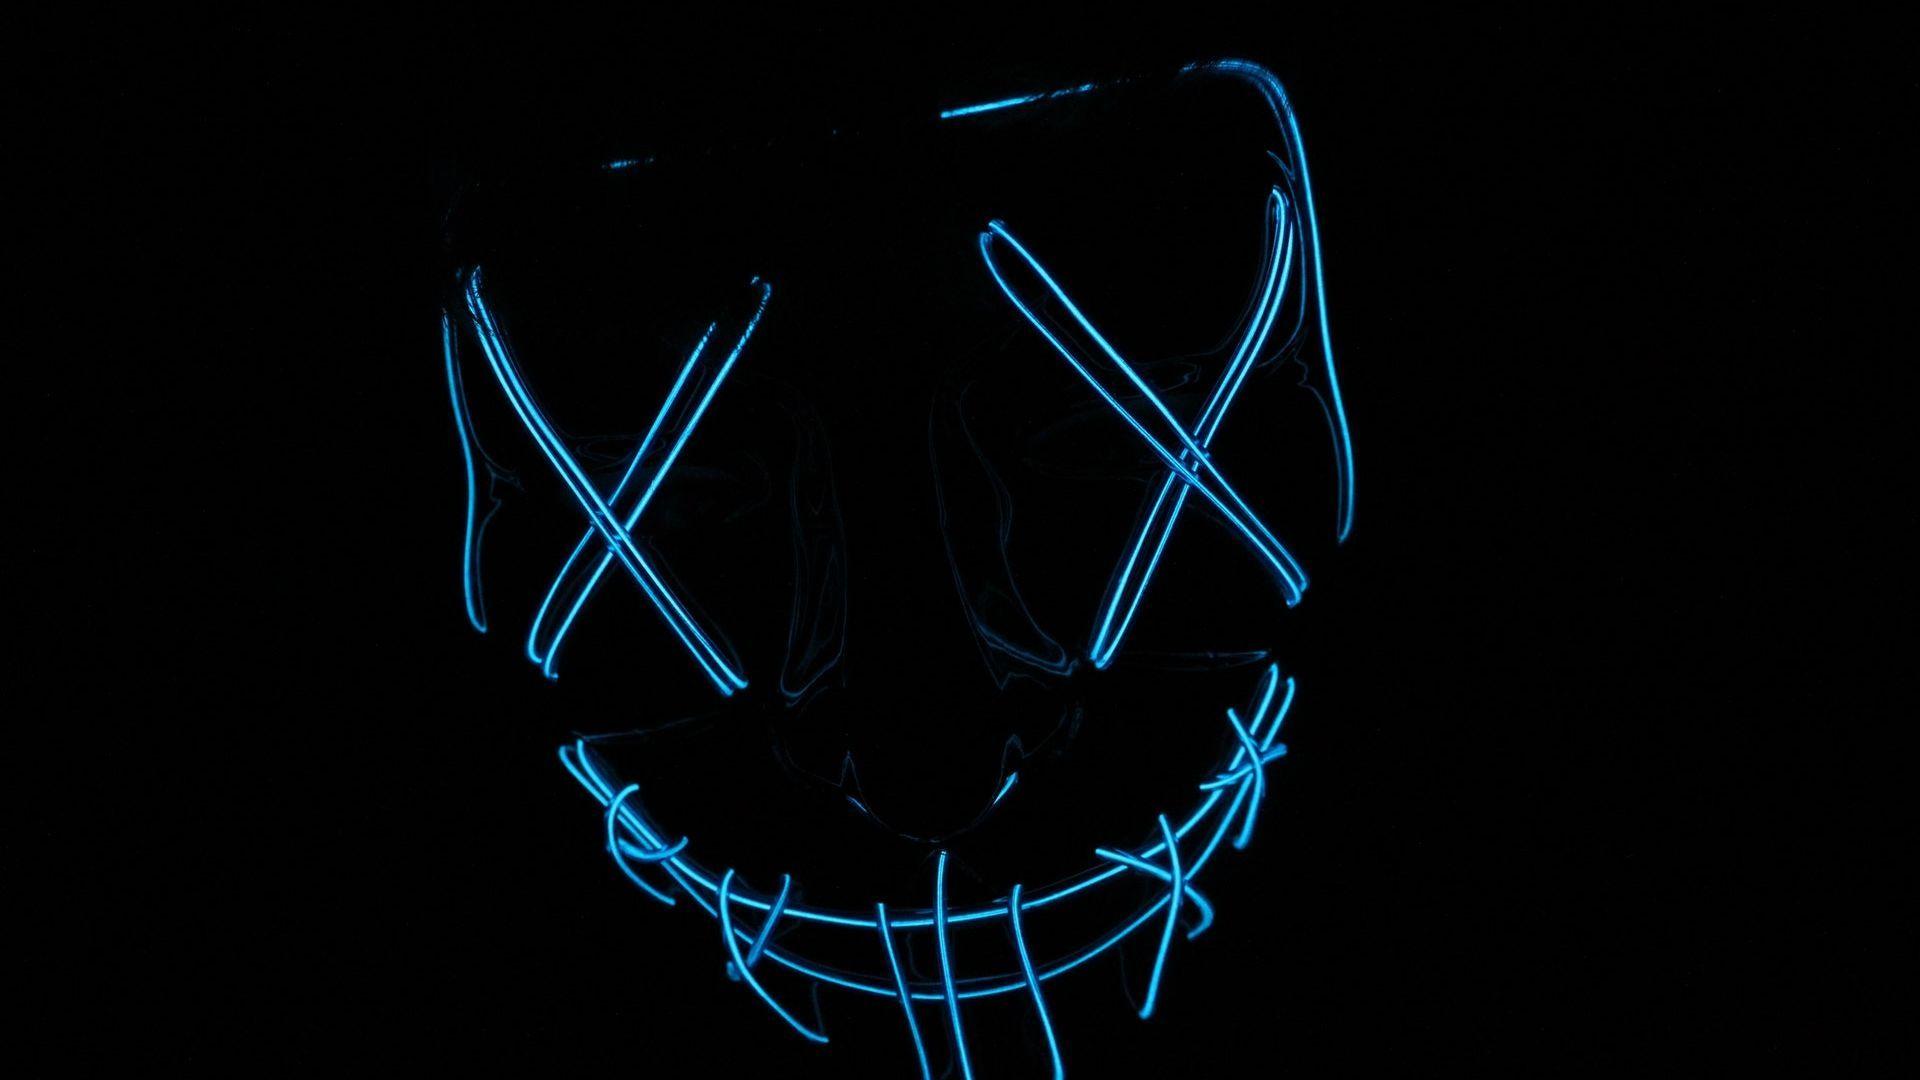 Black Neon Wallpapers On Wallpaperdog